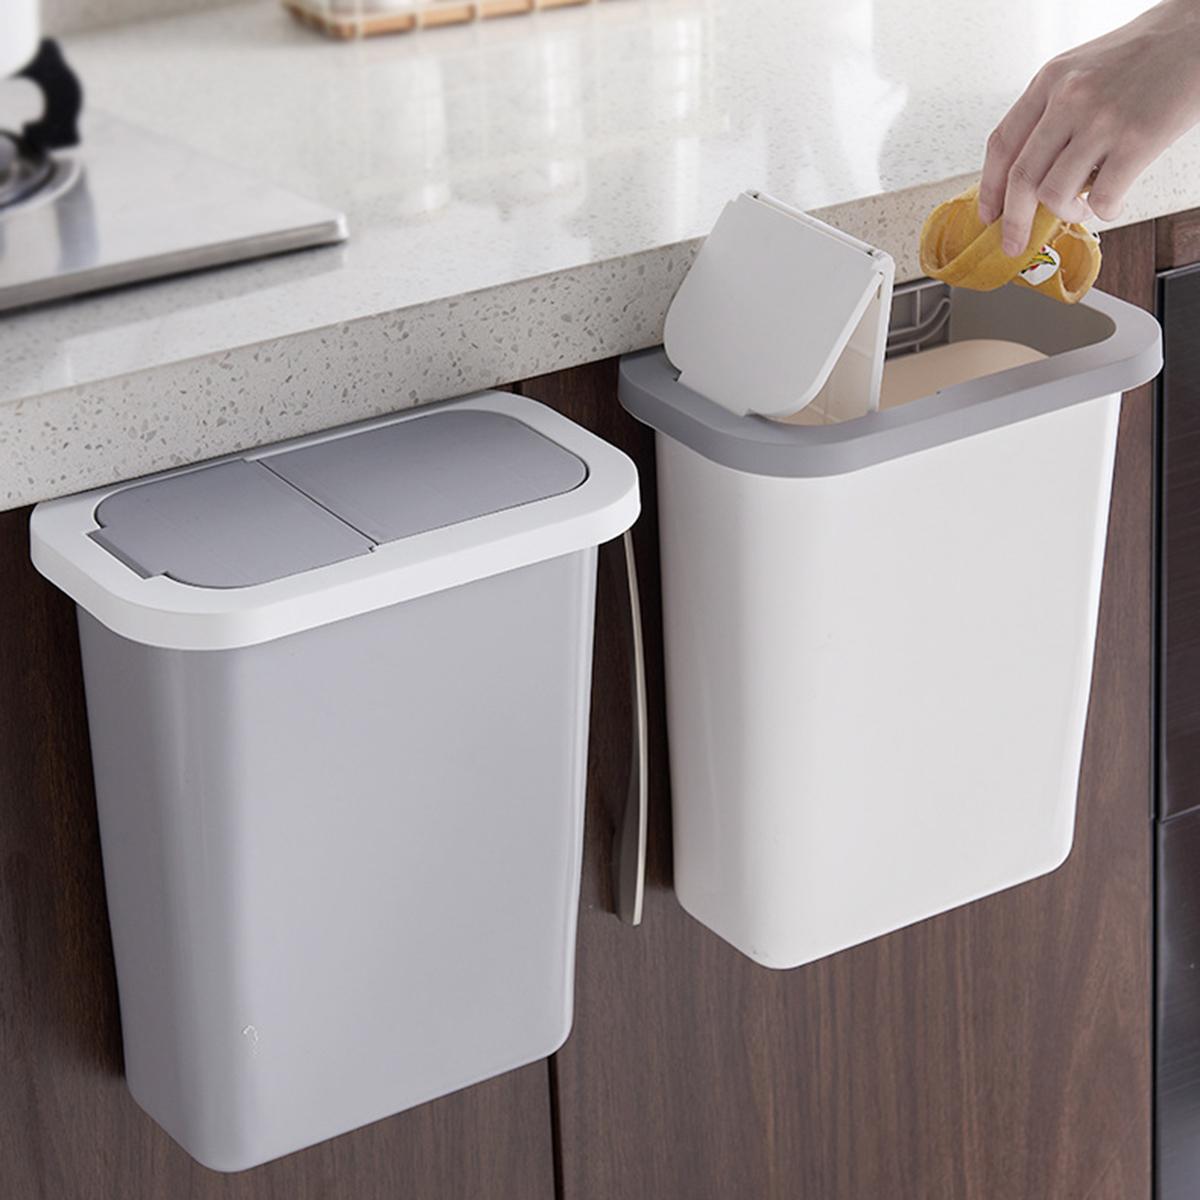 Home Wall Mounted Folding Waste Bin Kitchen Door Bin Can Rubbish Container Box